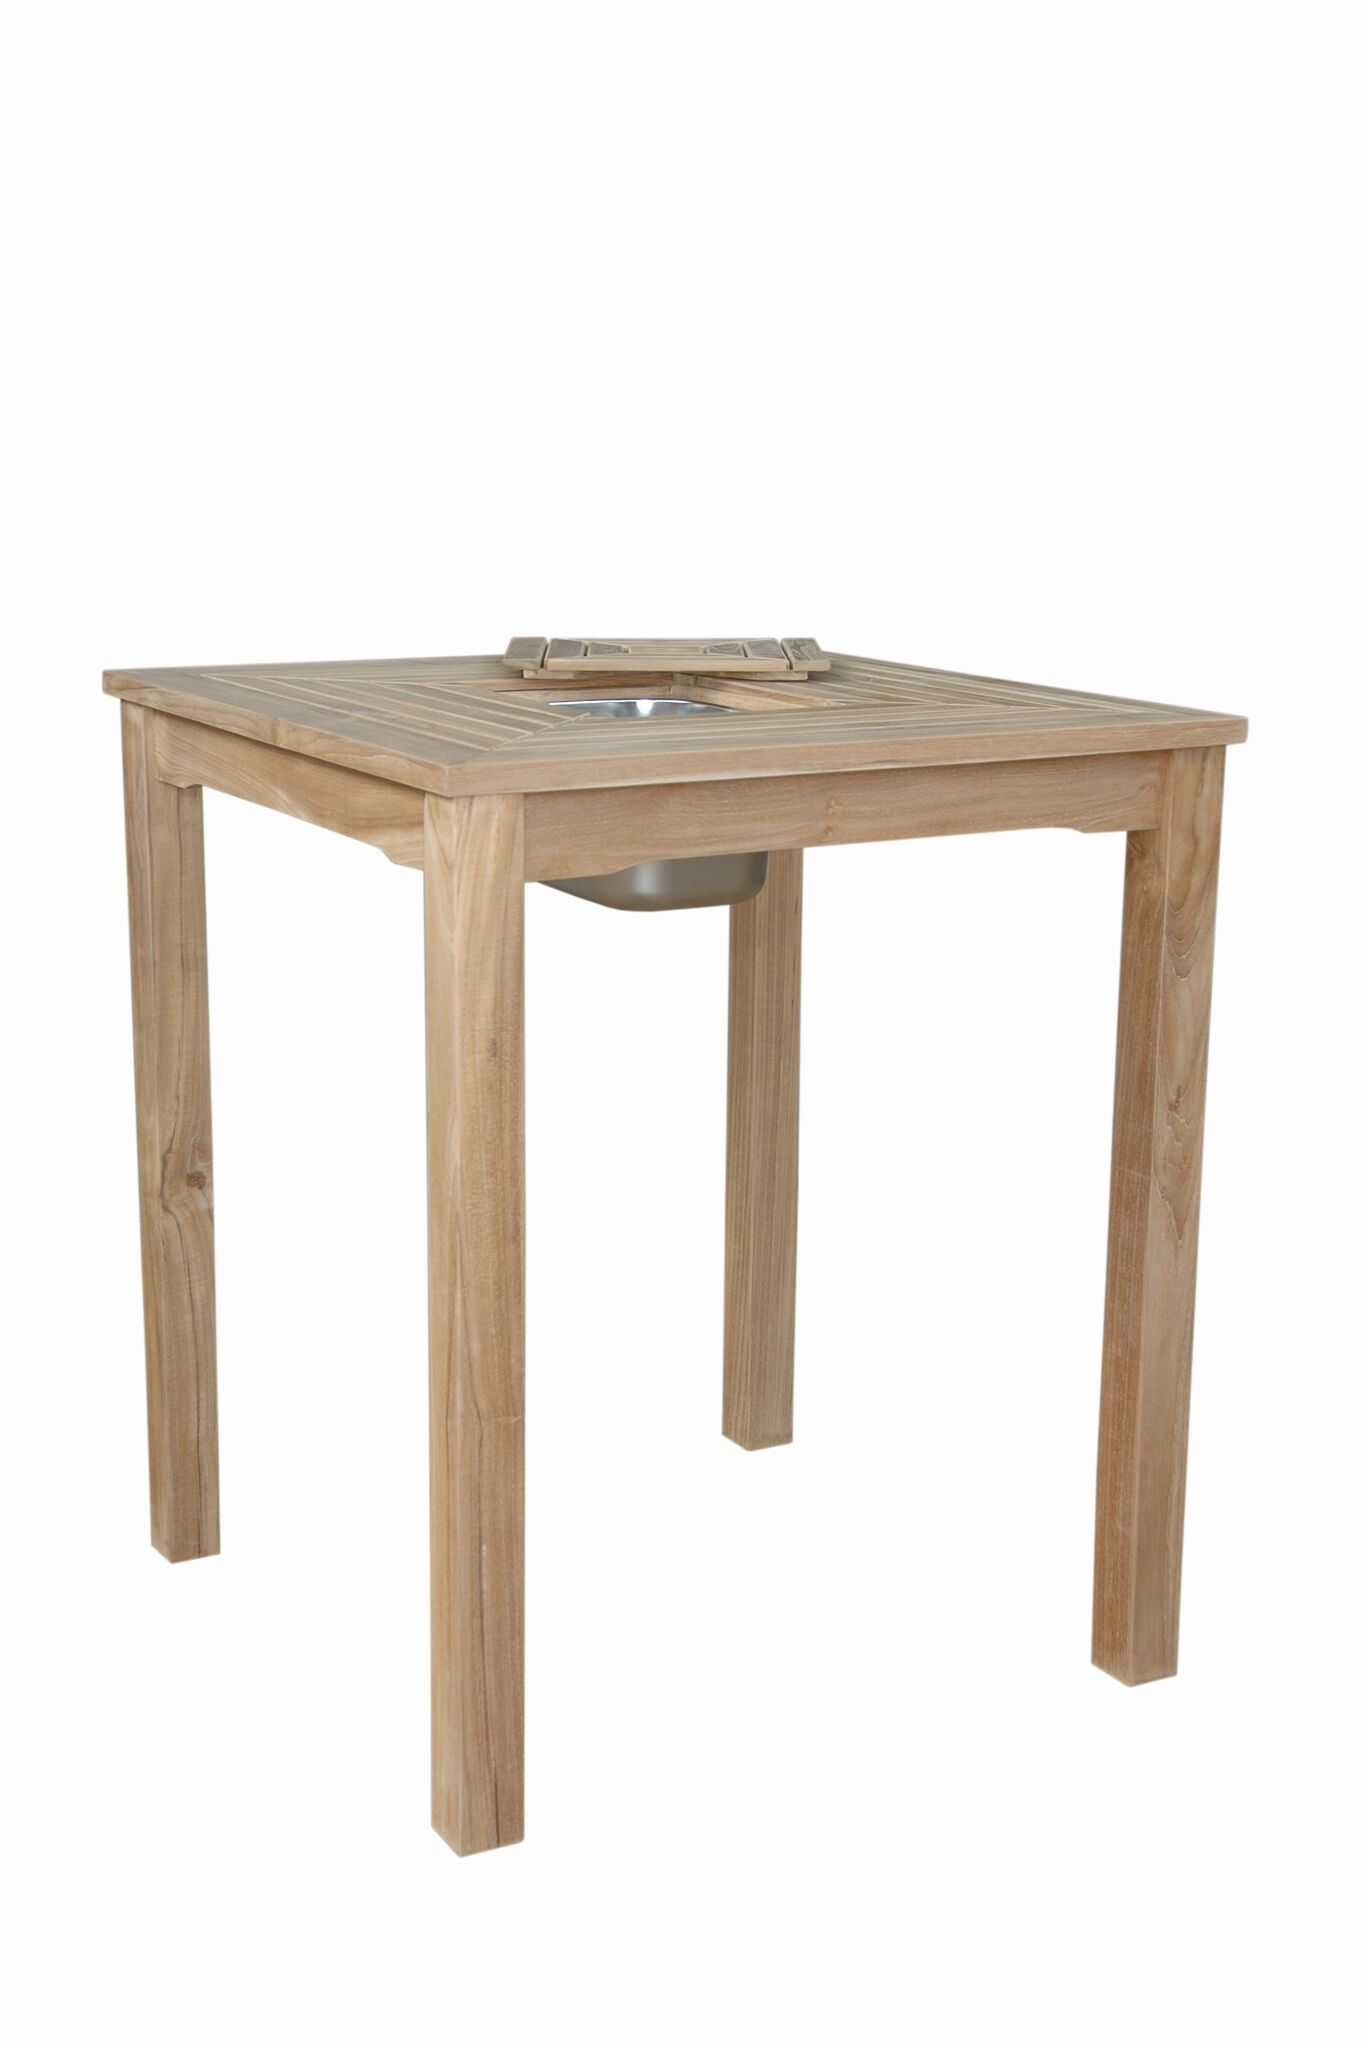 Anderson teak chatsworth ice chiller bar table tb 3636bt